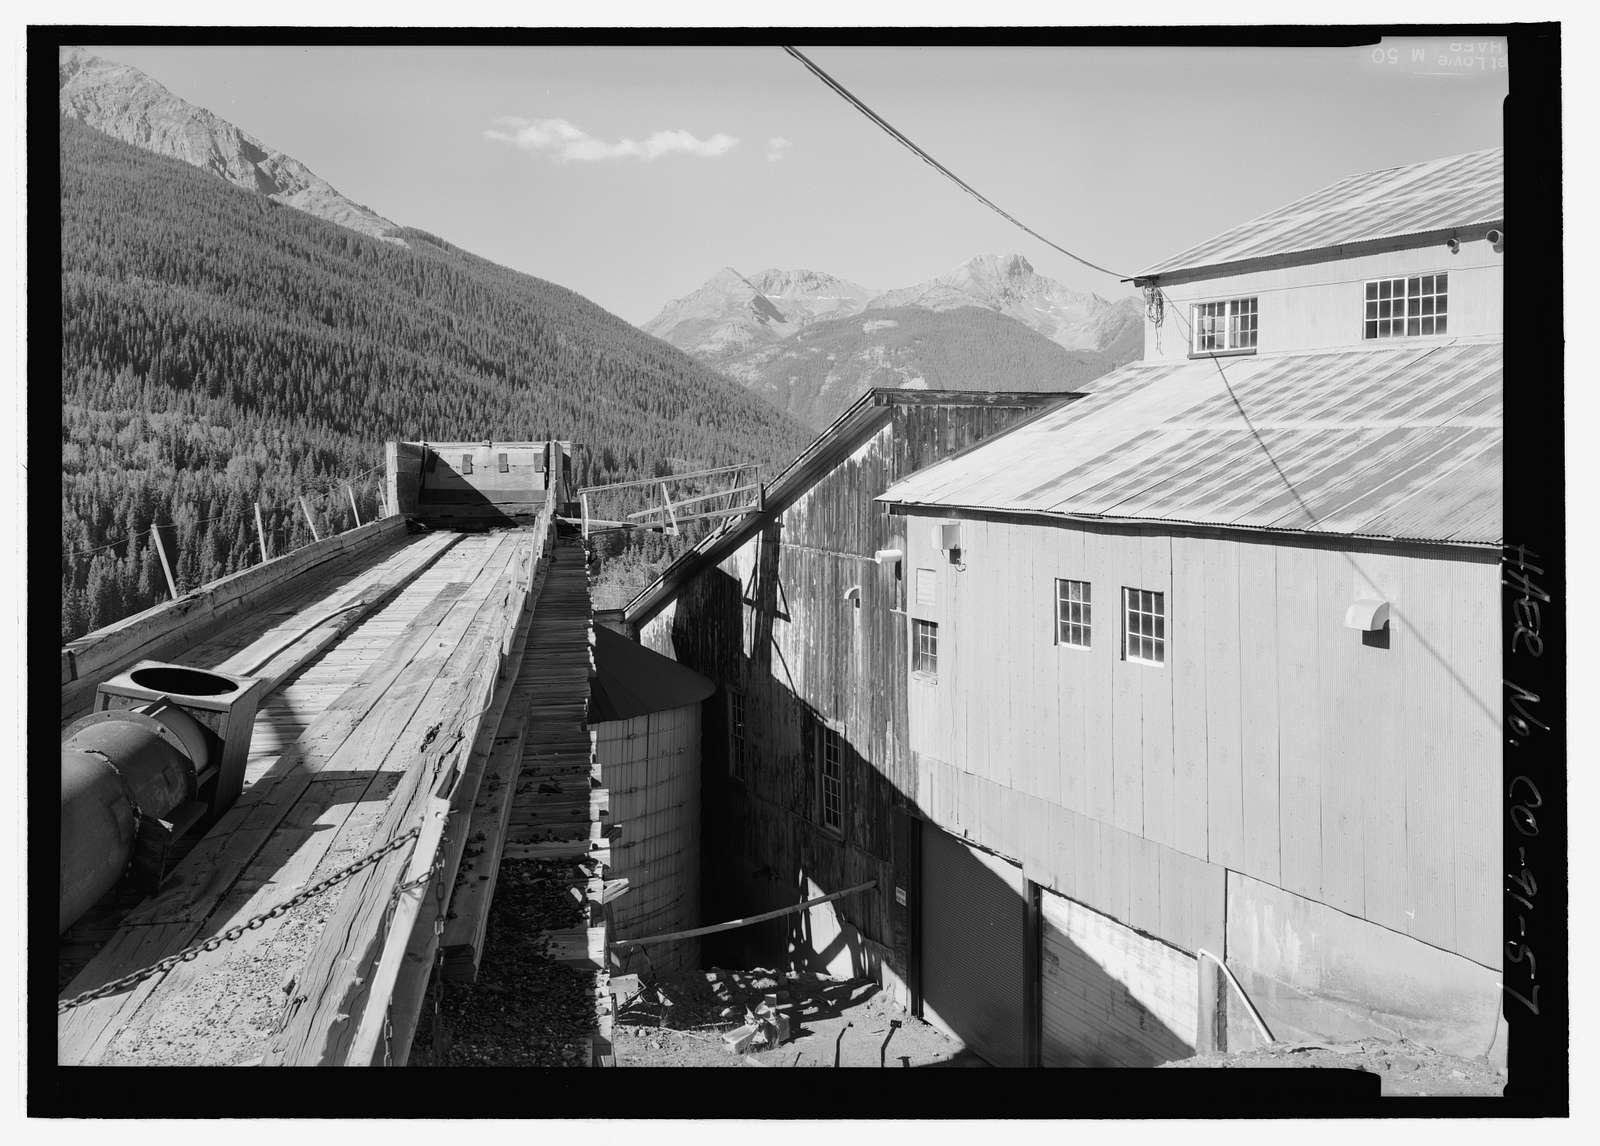 Shenandoah-Dives Mill, 135 County Road 2, Silverton, San Juan County, CO